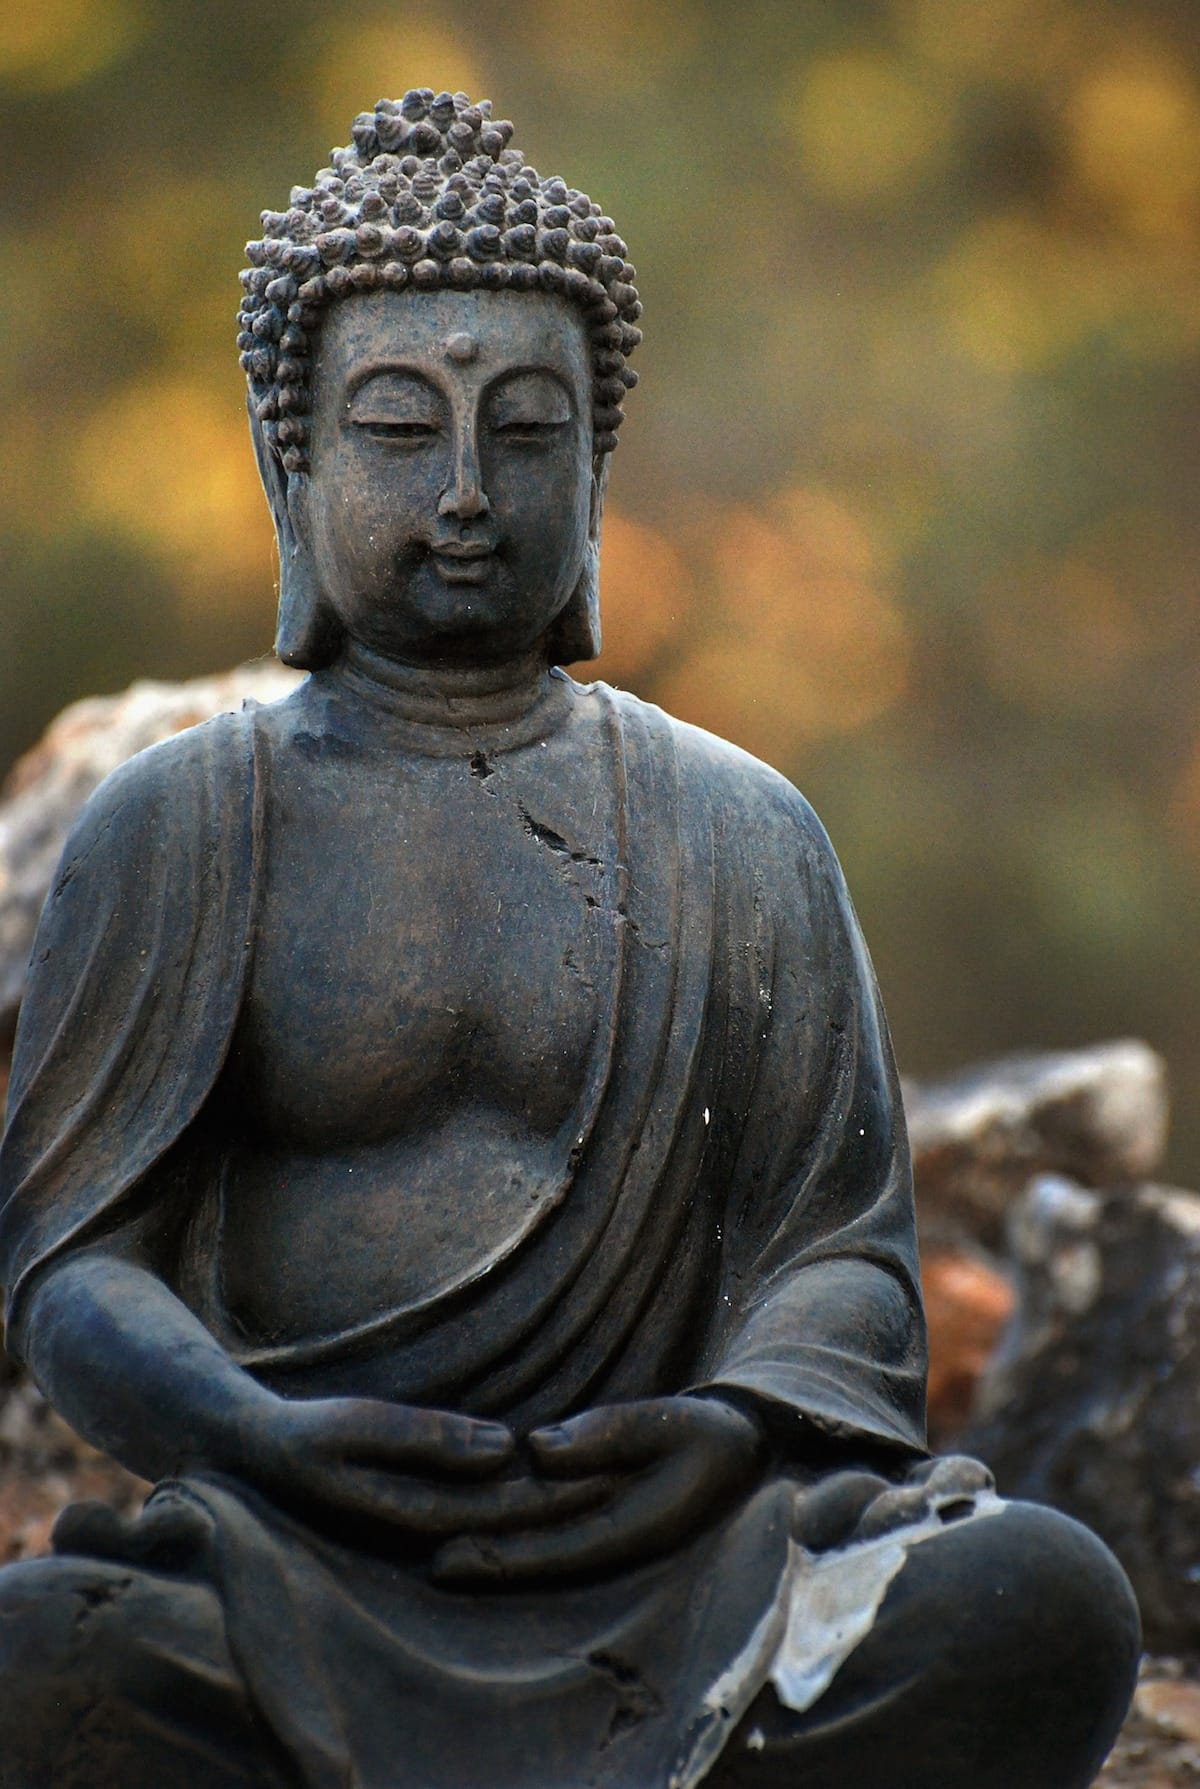 Mahayana, Way of the Bodhisattva, Vajrayana / Tibetan Buddhism, Sakyong Mipham, Shambhala Sun, Lion's Roar, Buddhism